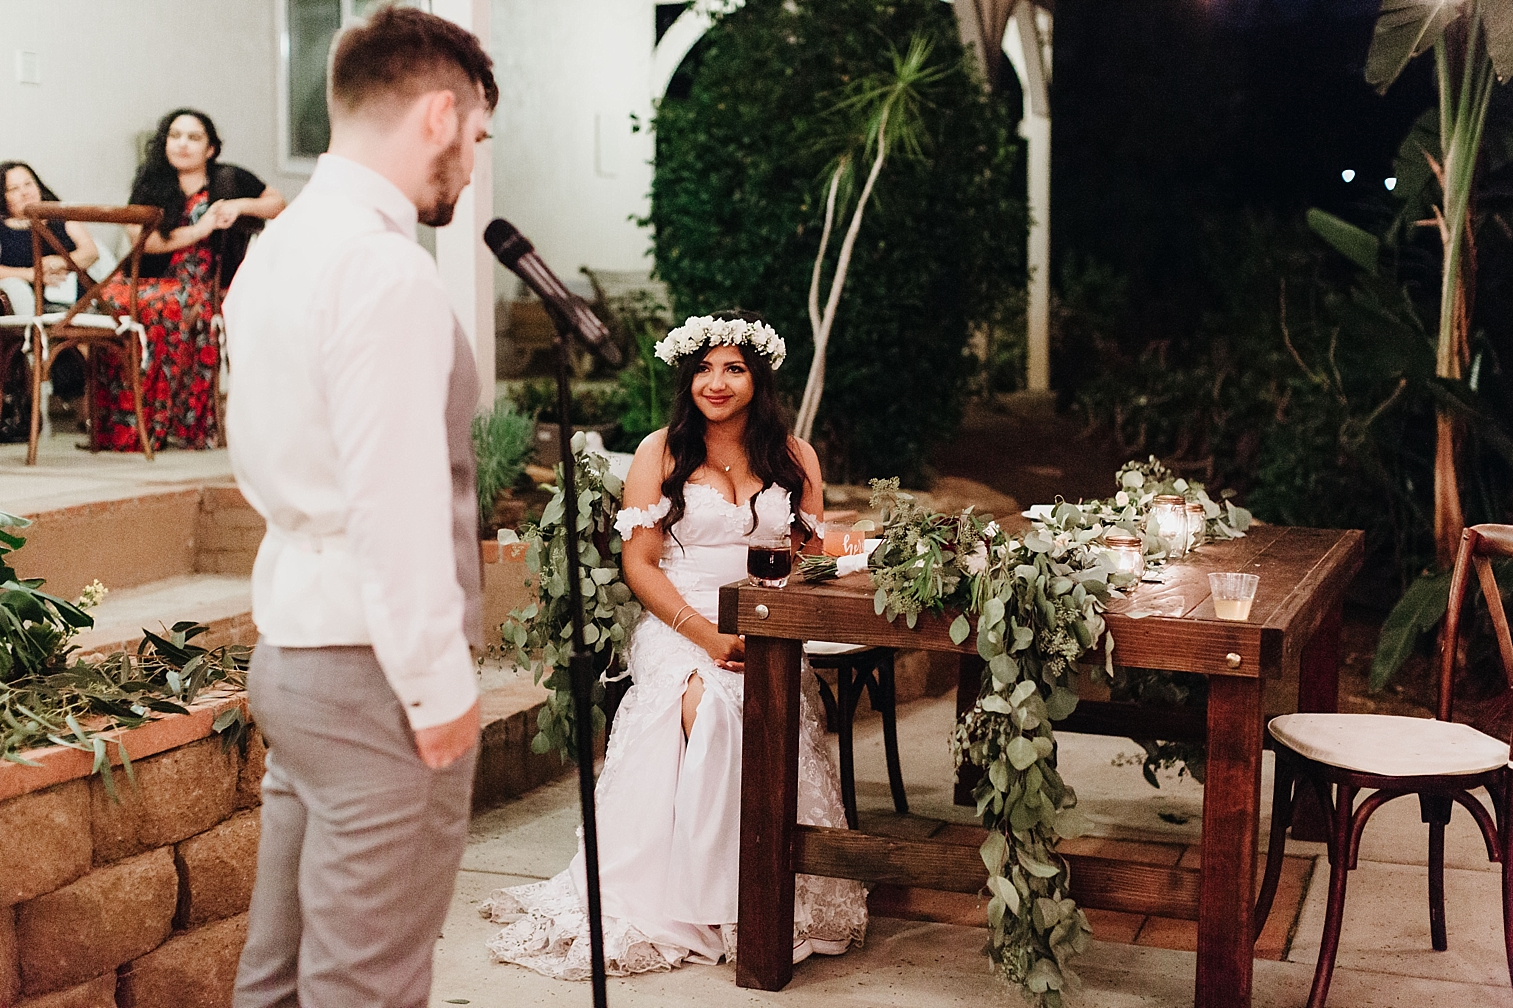 Escondido-Backyard-Wedding-50.jpg